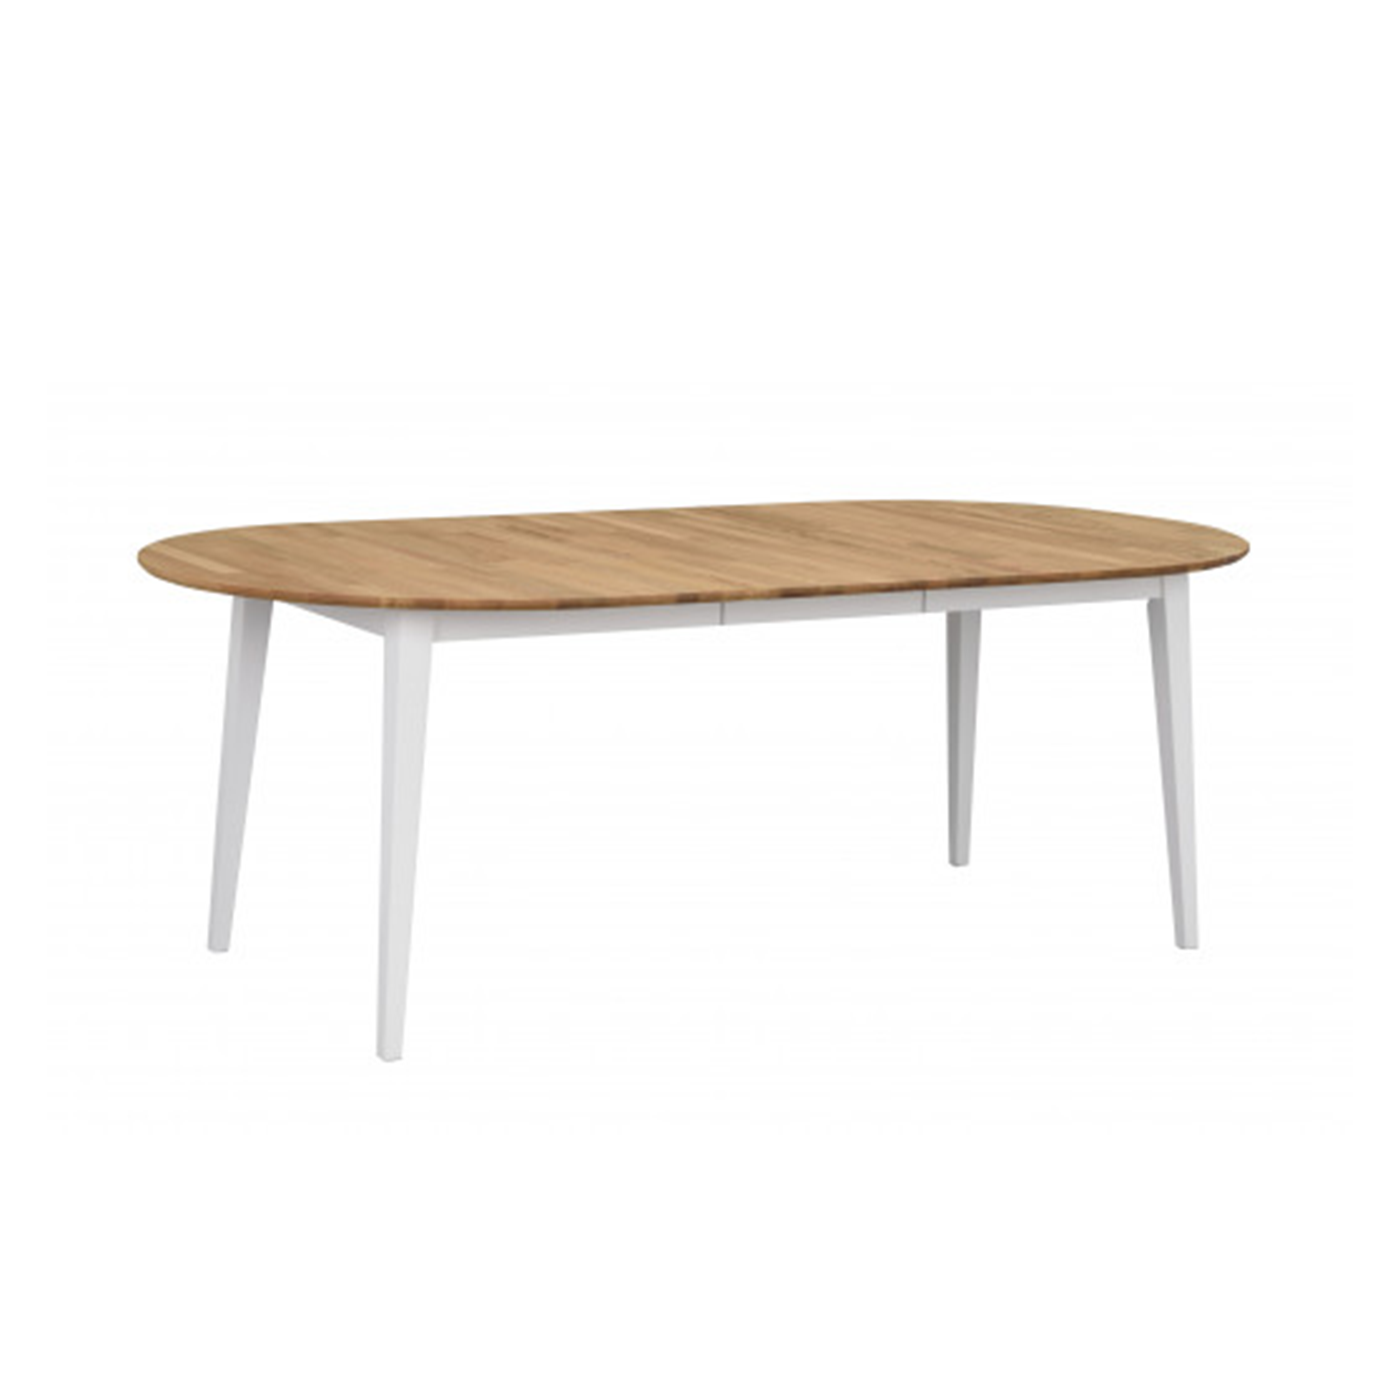 Uittrekbare Eiken Tafel.Nordiq Filippa Table Uitschuifbare Eettafel Ovaal 170 Tot 210